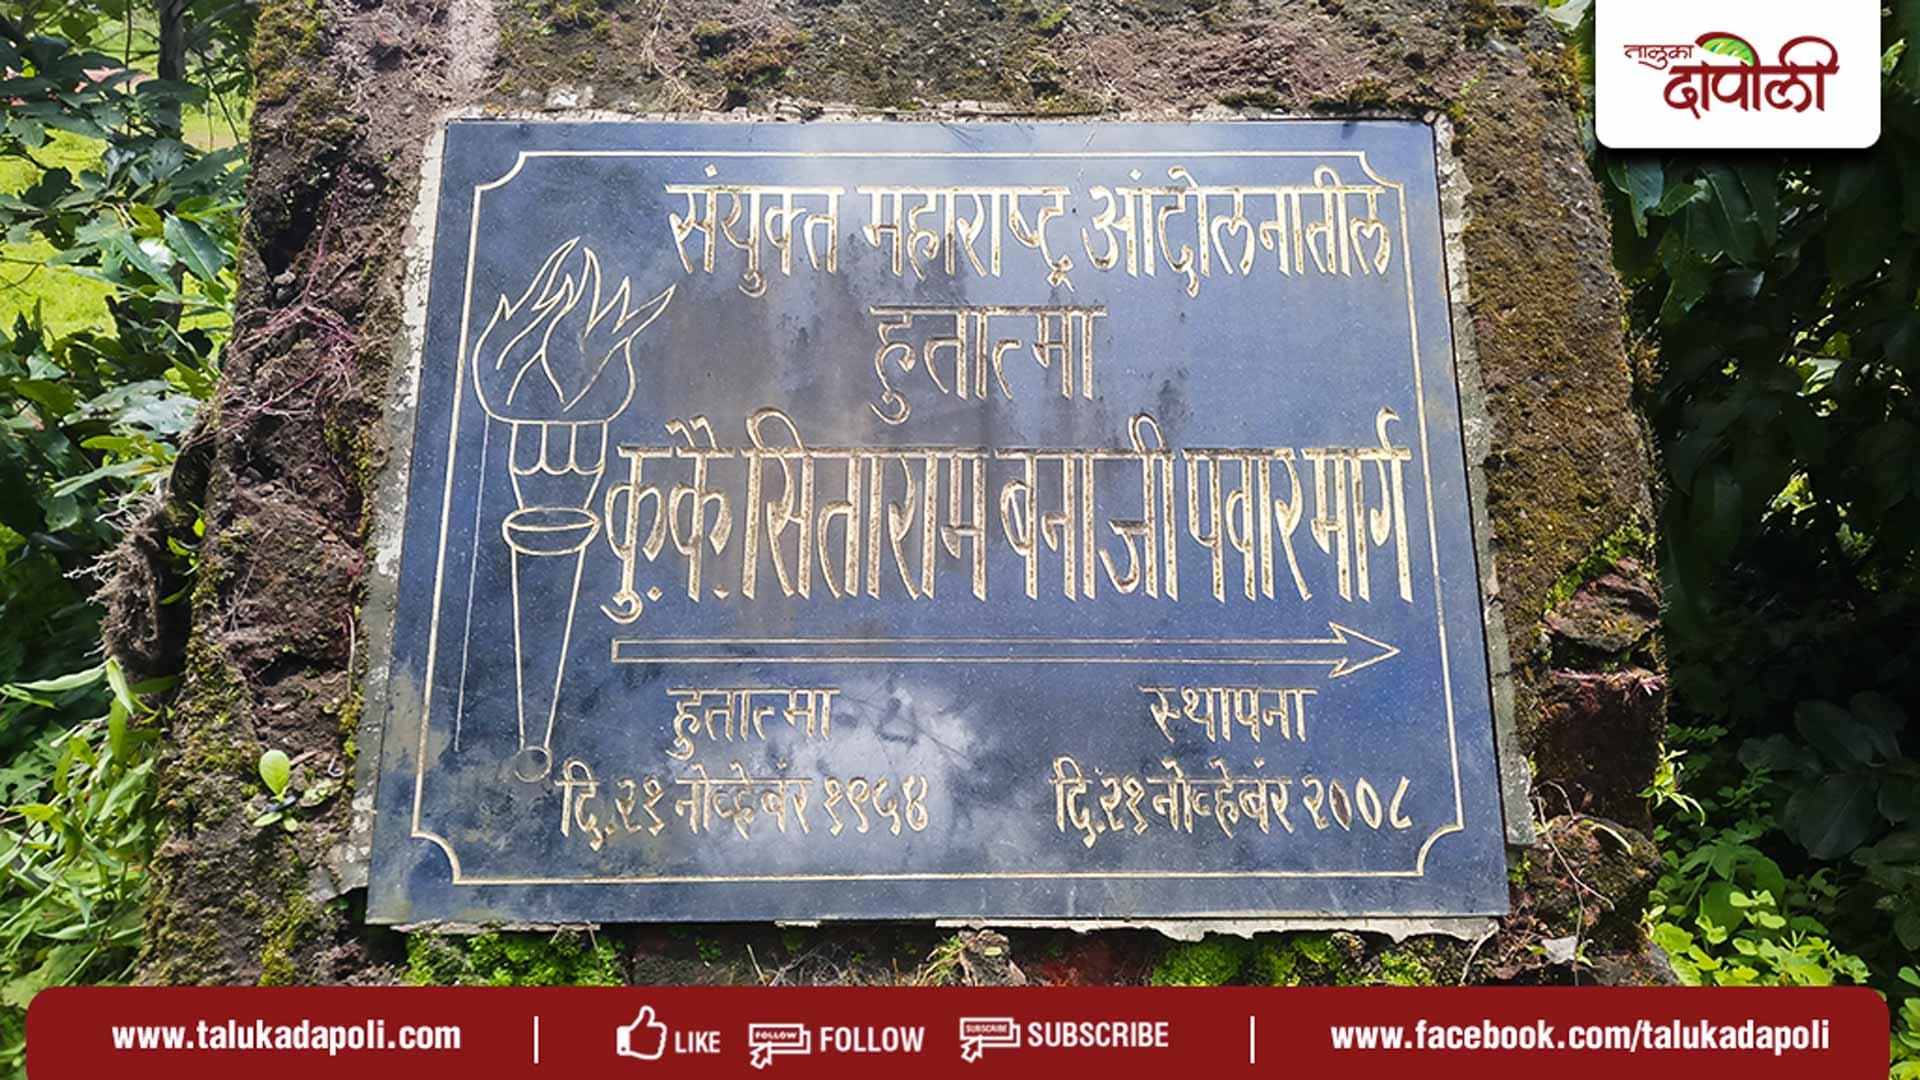 Sitaram Banaji Pawar - hutamta chalwal mumbai | Taluka Dapoli